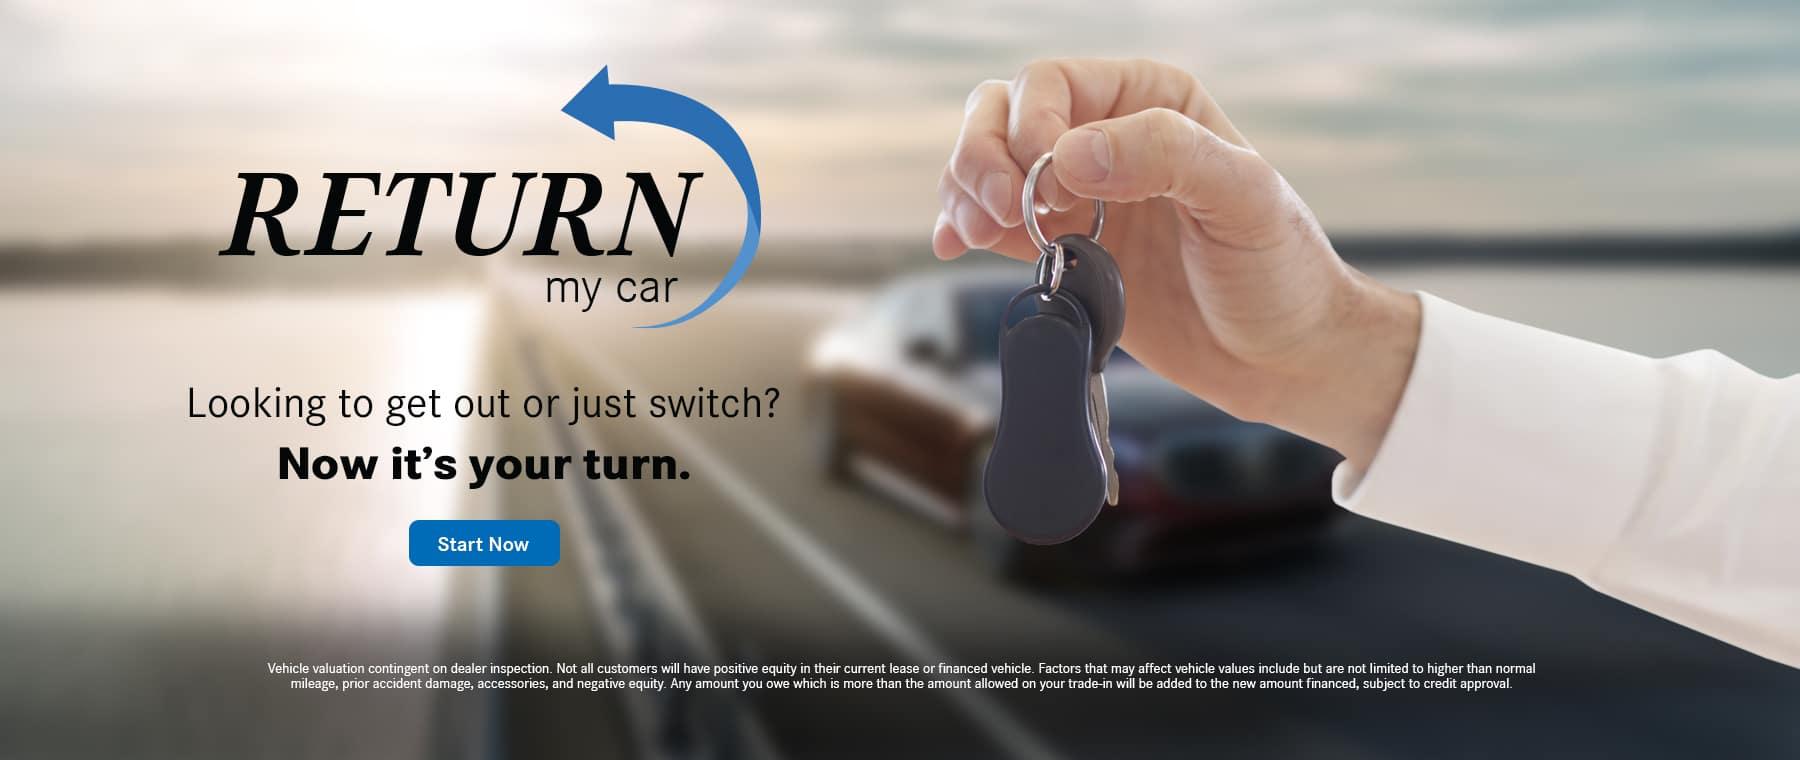 Return my car MB – revised